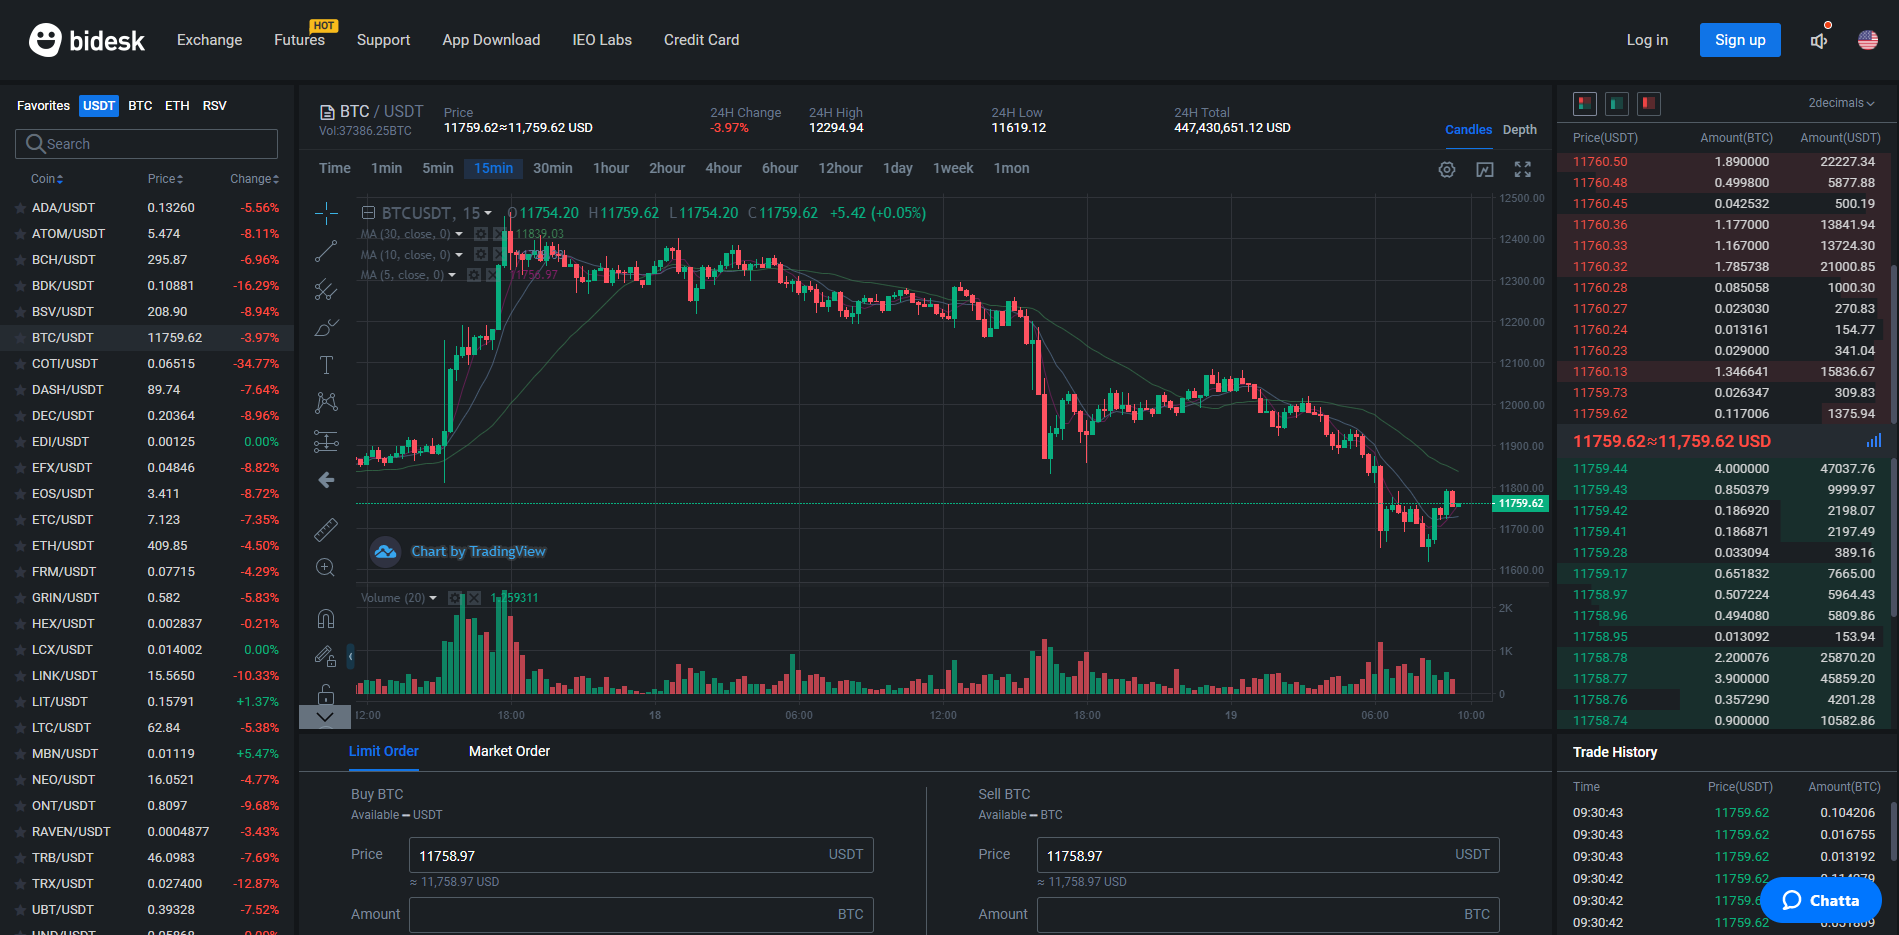 Bidesk Trading View